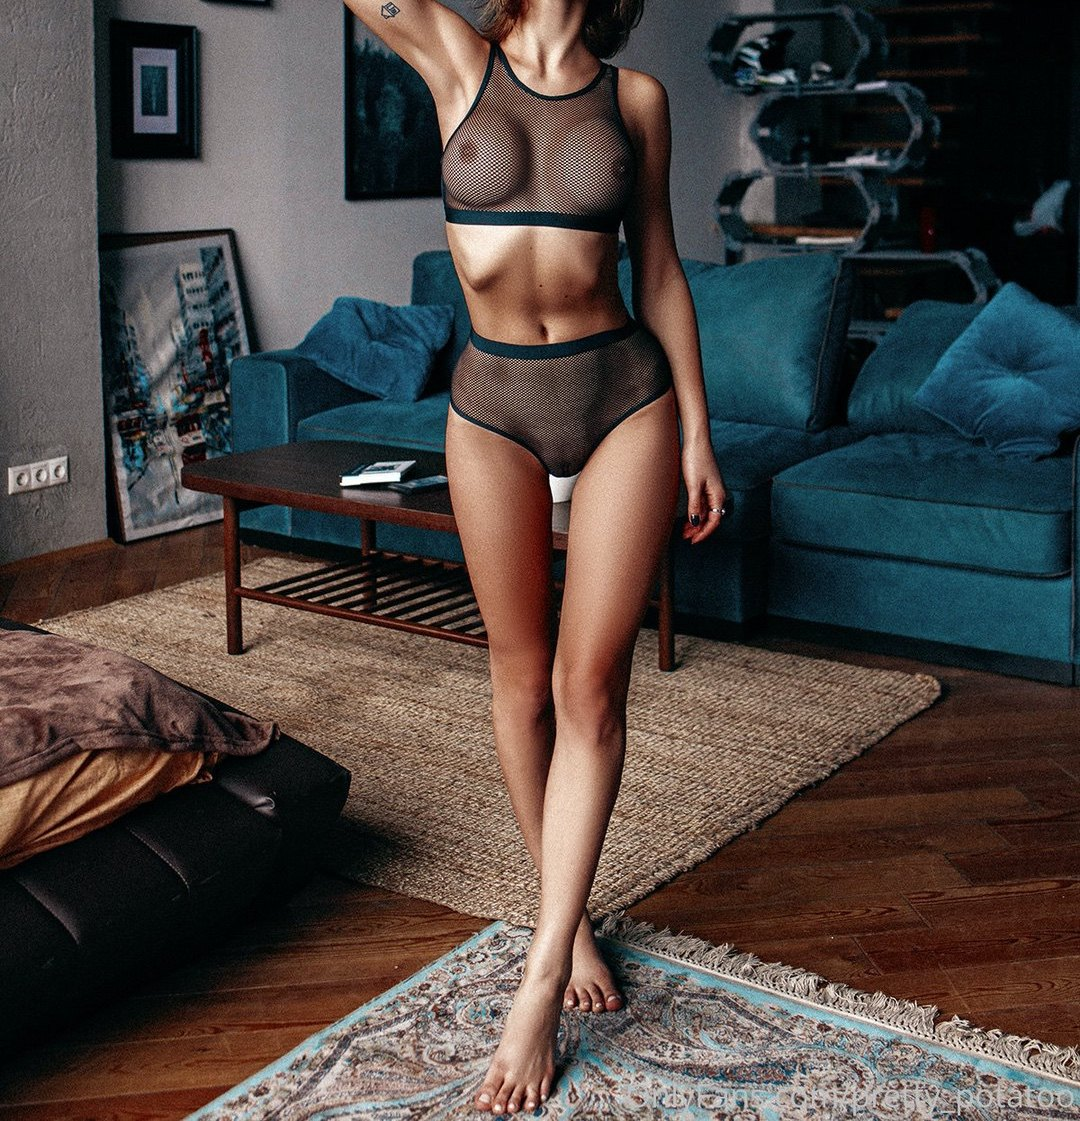 Janna Pavlova Pretty Potatoo Onlyfans Nudes Leaks 0033